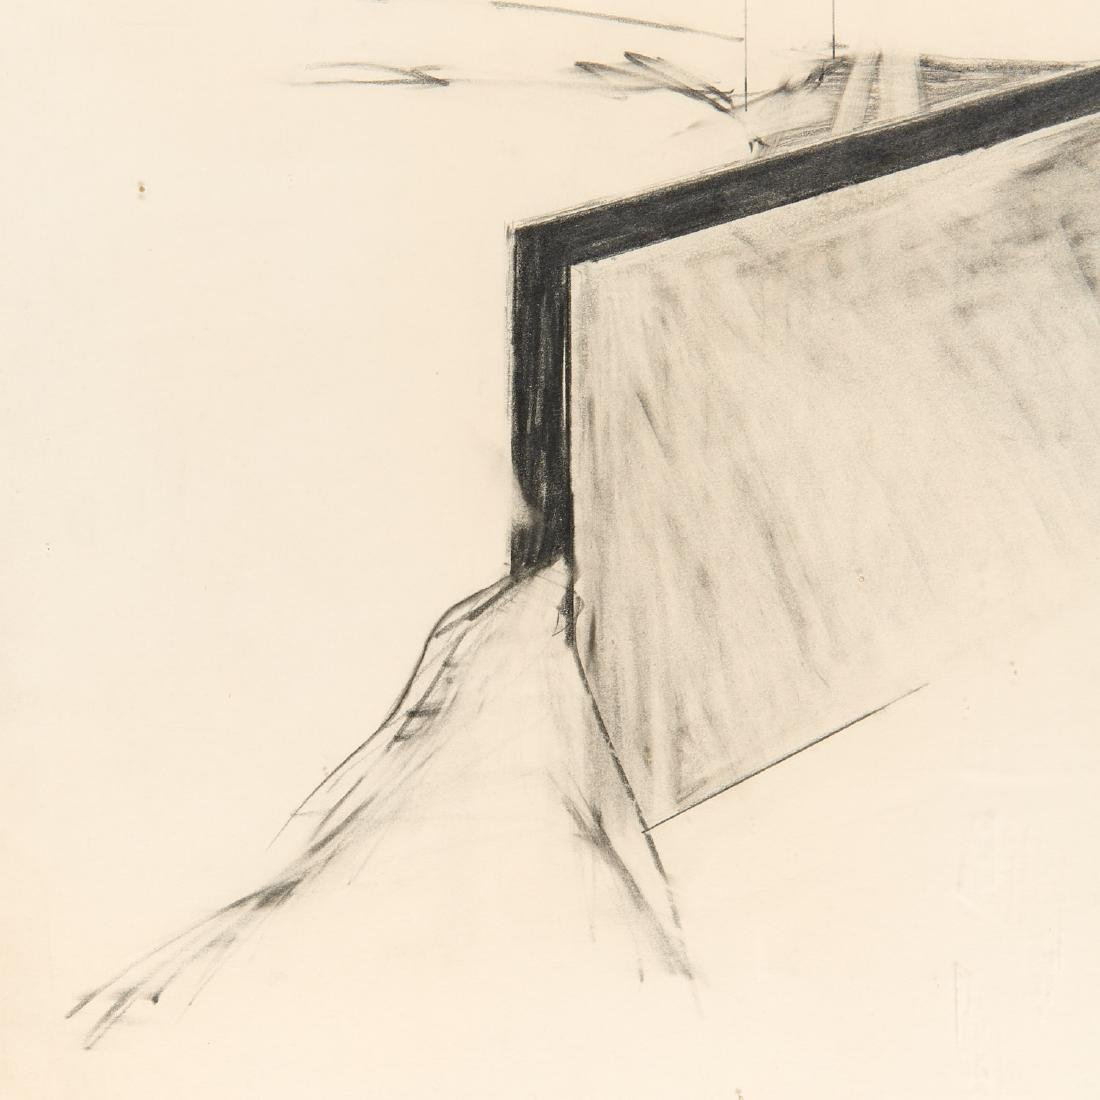 Laddie John Dill, drawing - 4